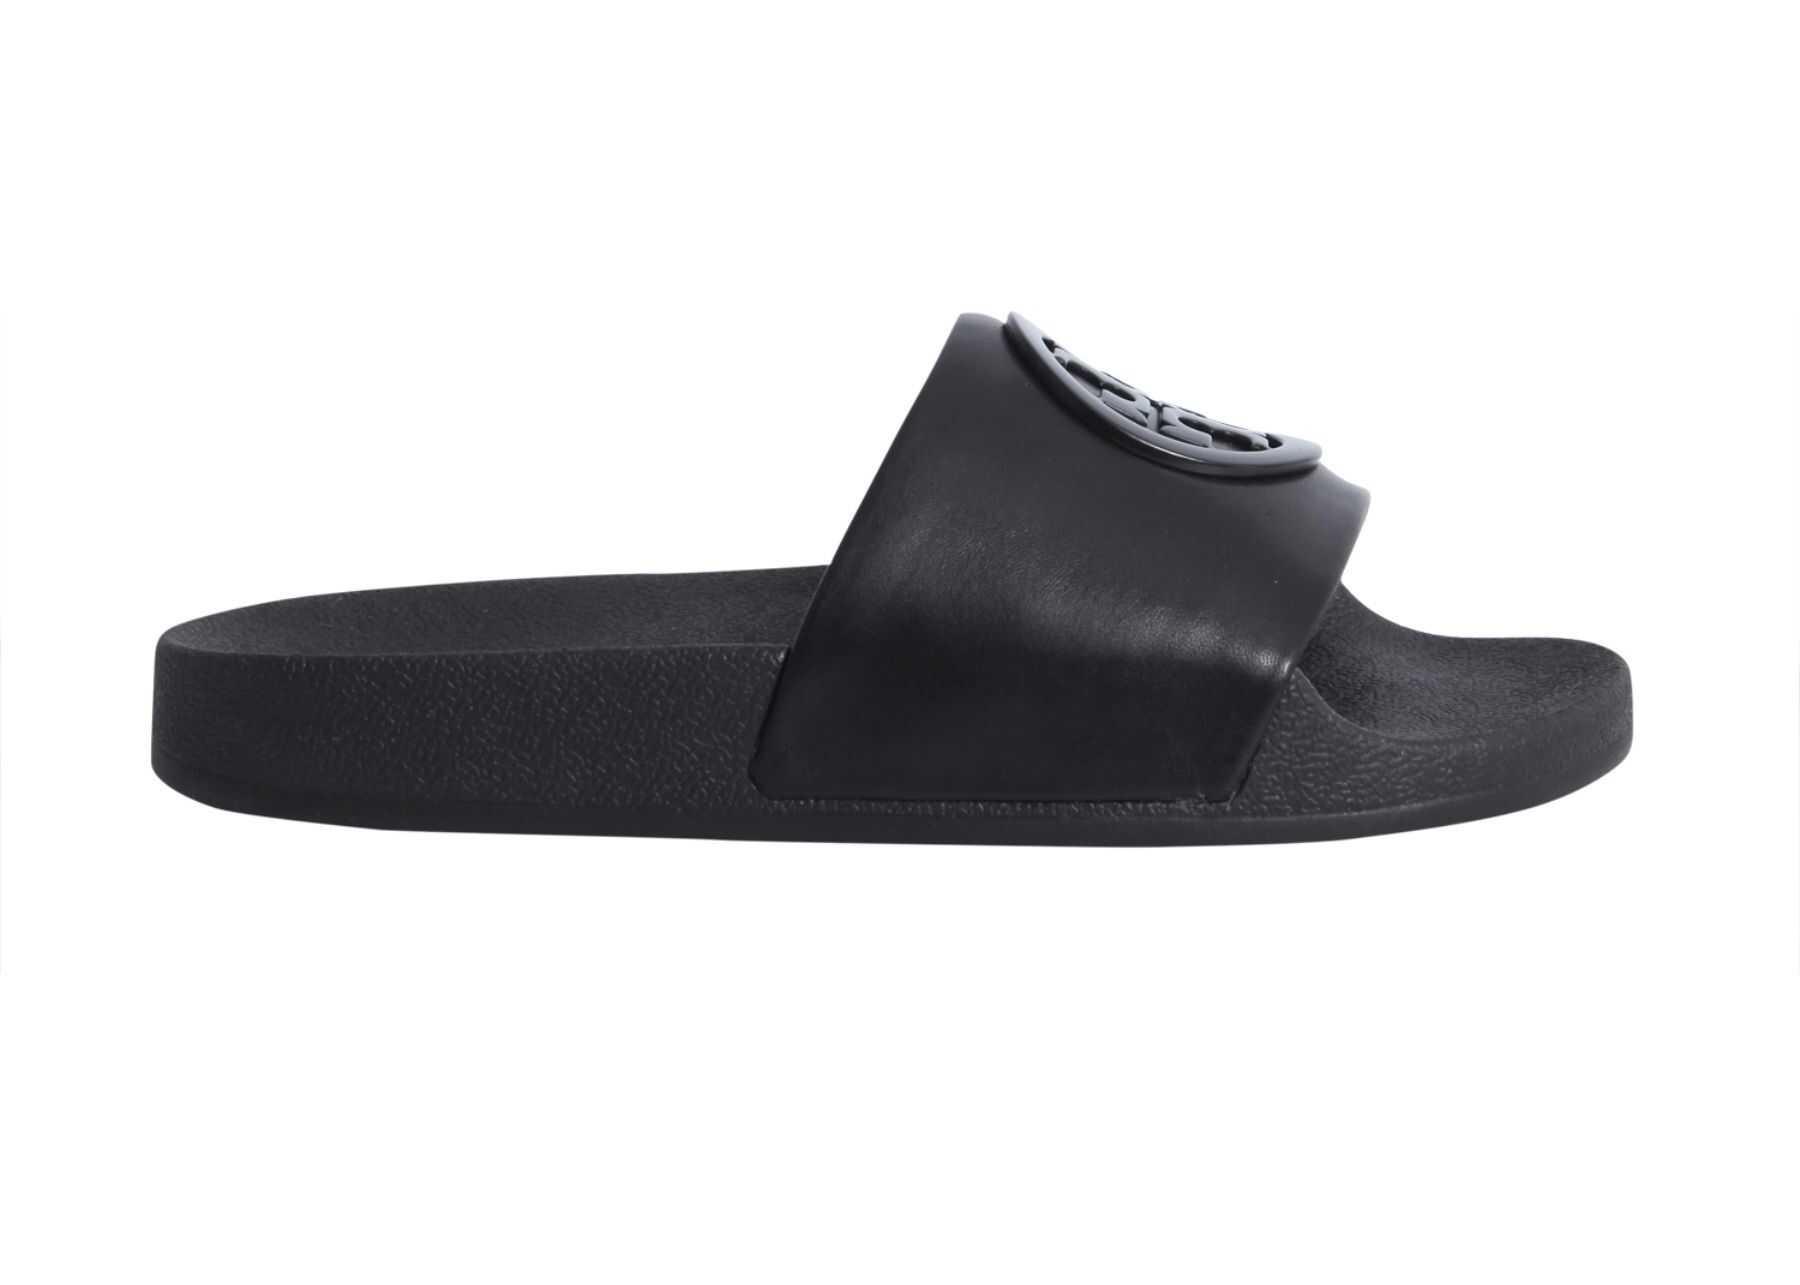 Tory Burch Lina Slide Sandals BLACK